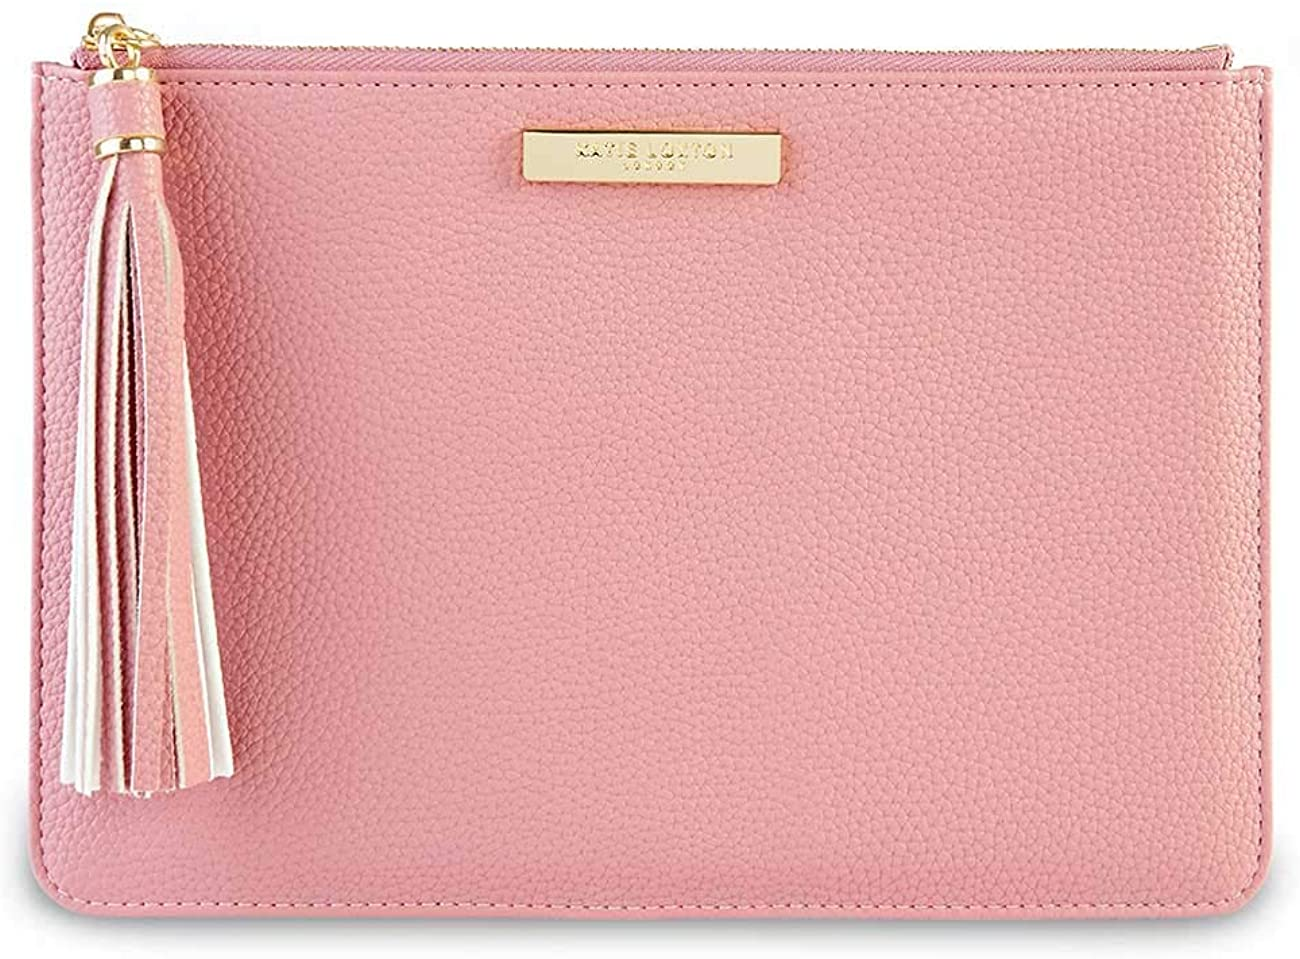 Katie Loxton Tassel Pouch Womens Vegan Leather Medium Clutch Handbag Pink